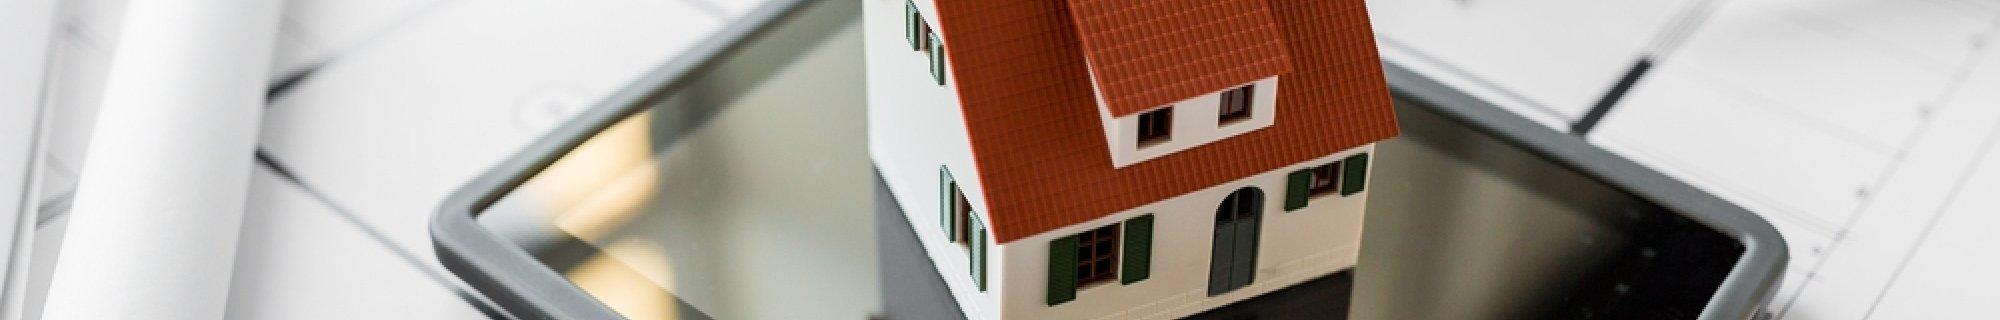 measuring tape, drawings, house model, ipad